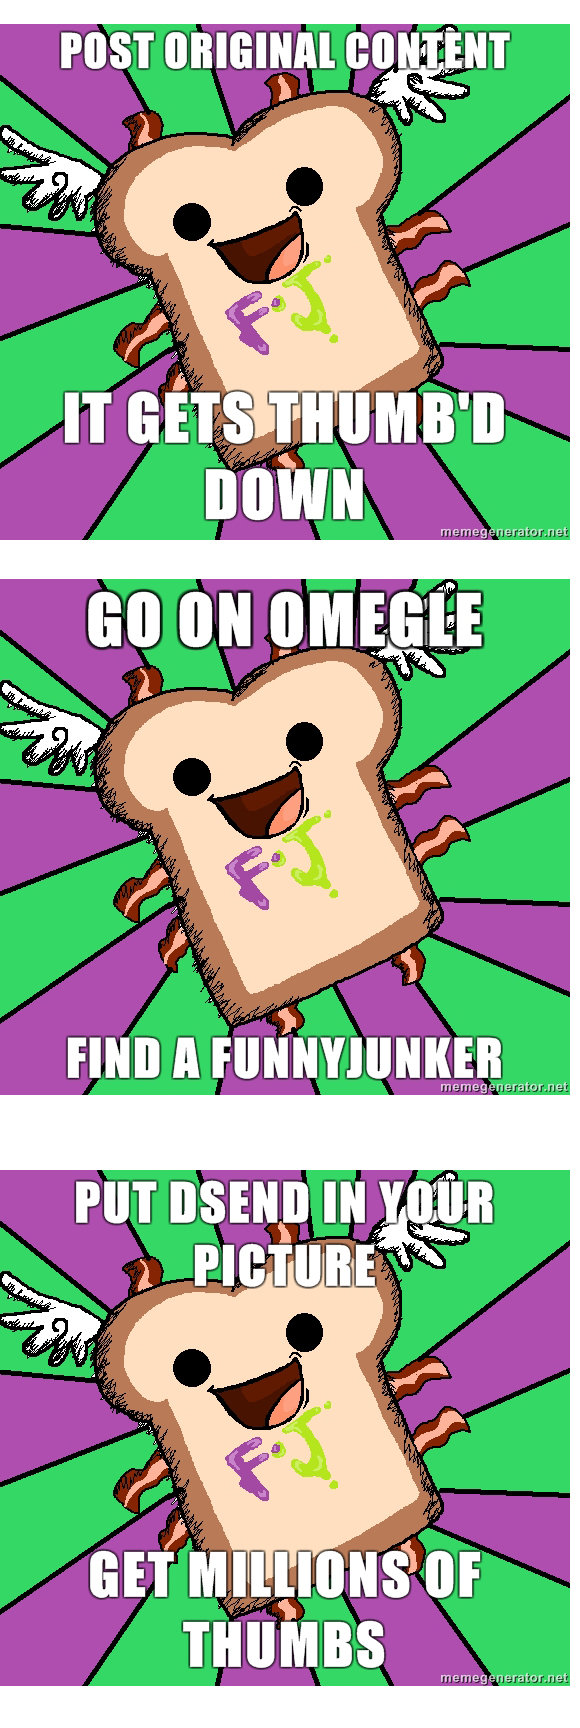 jolly funnyjunk meme